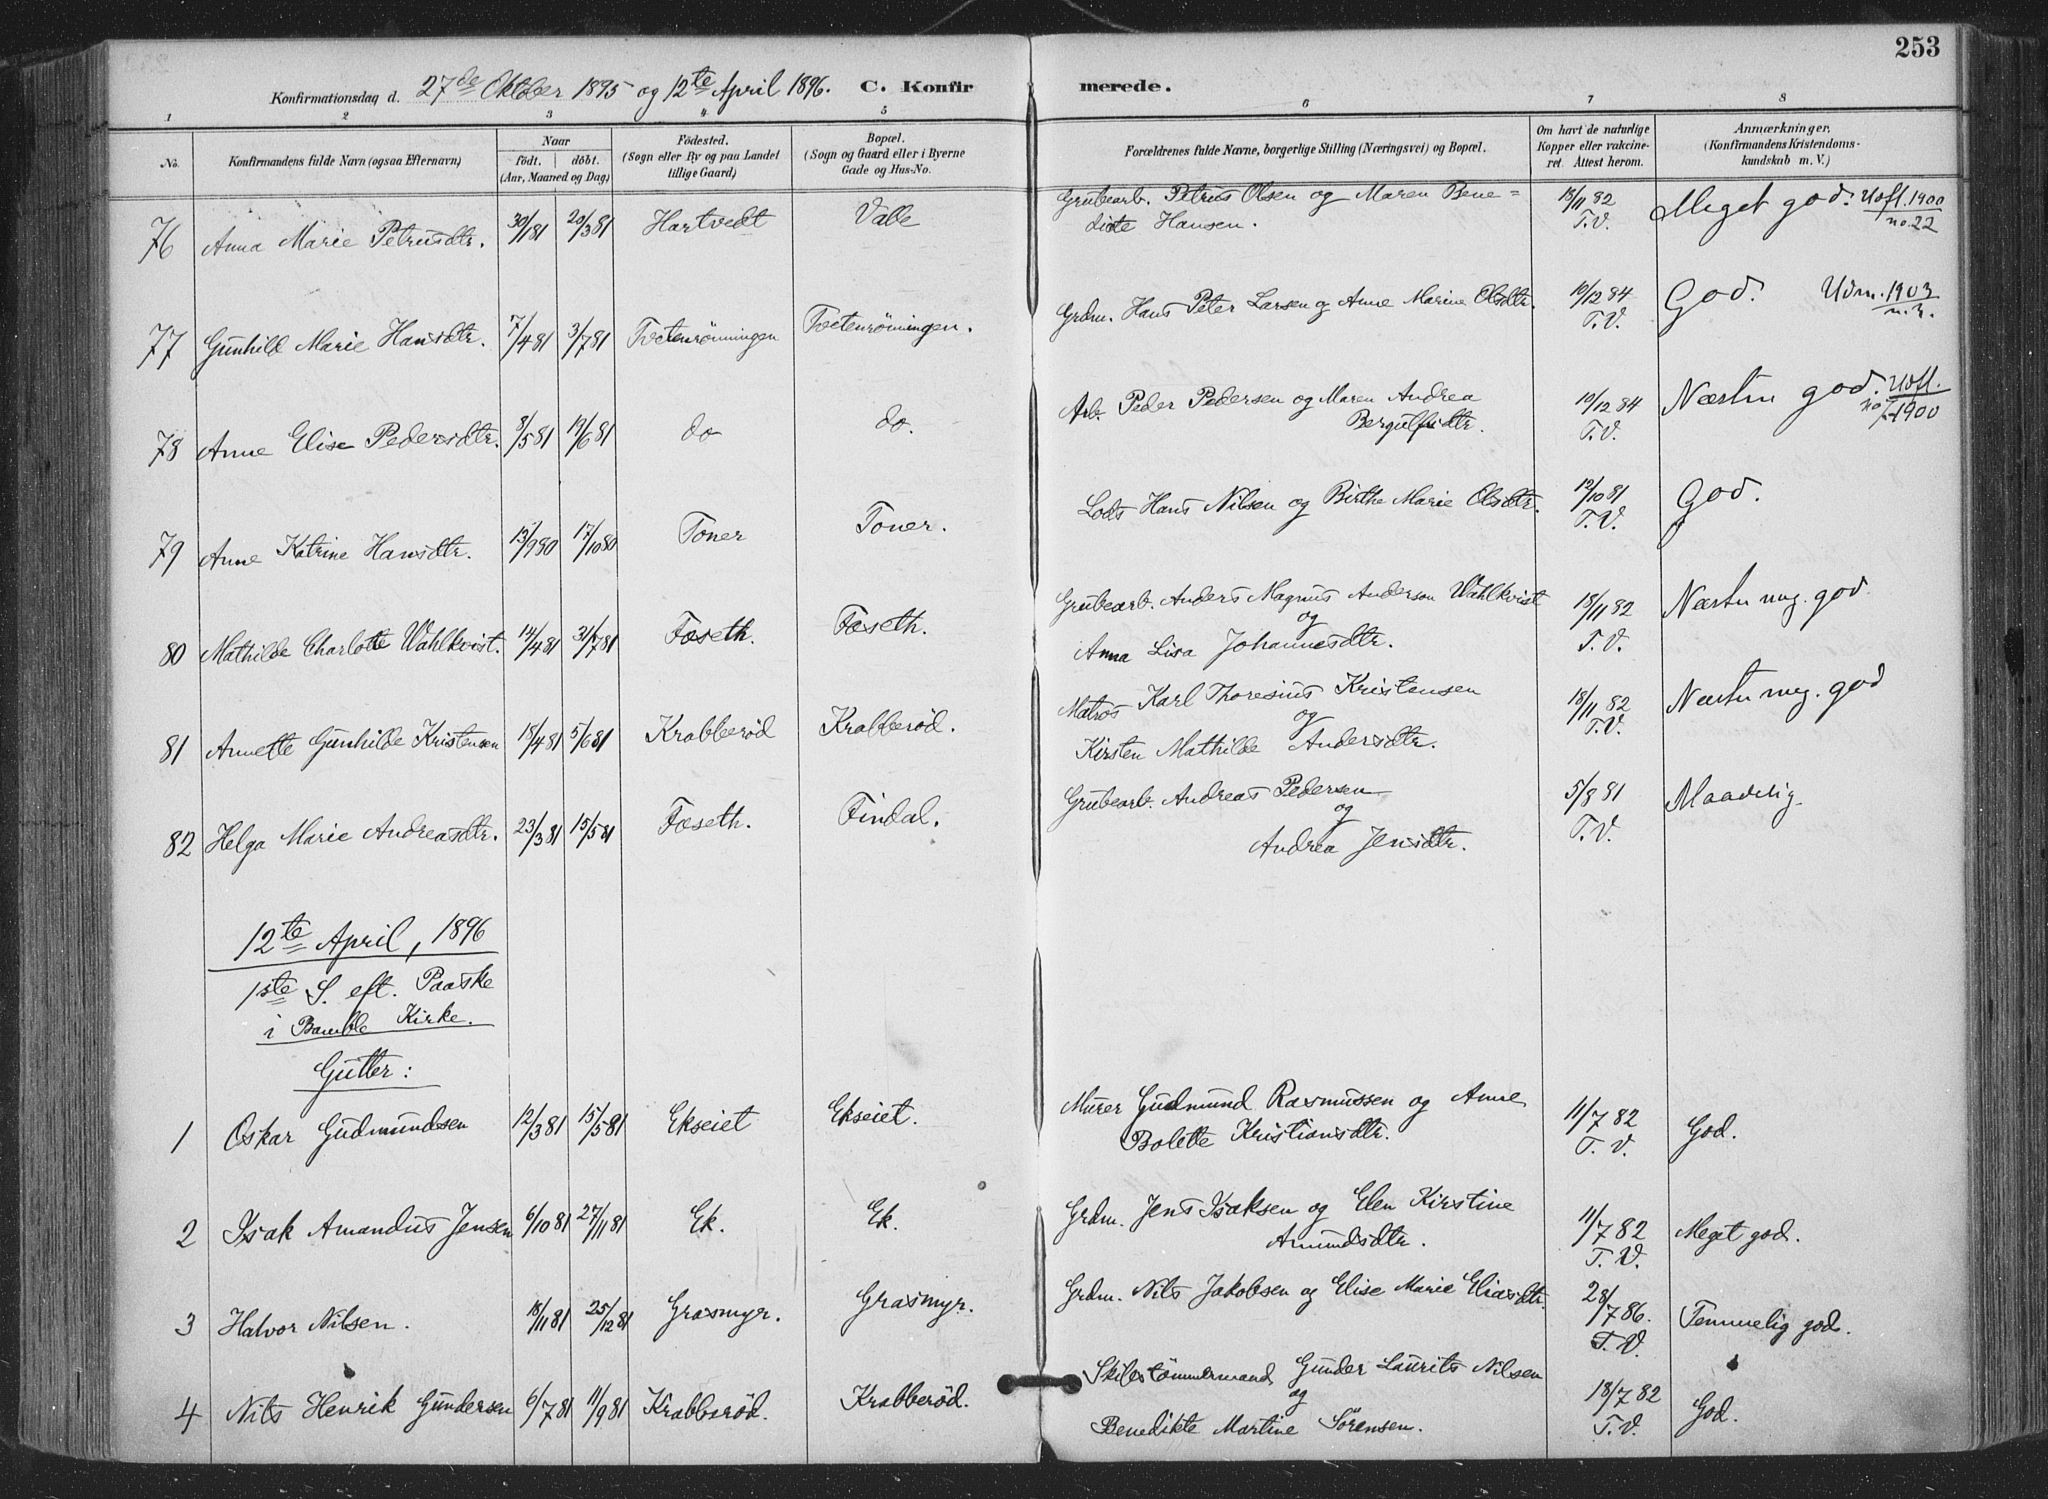 SAKO, Bamble kirkebøker, F/Fa/L0008: Ministerialbok nr. I 8, 1888-1900, s. 253